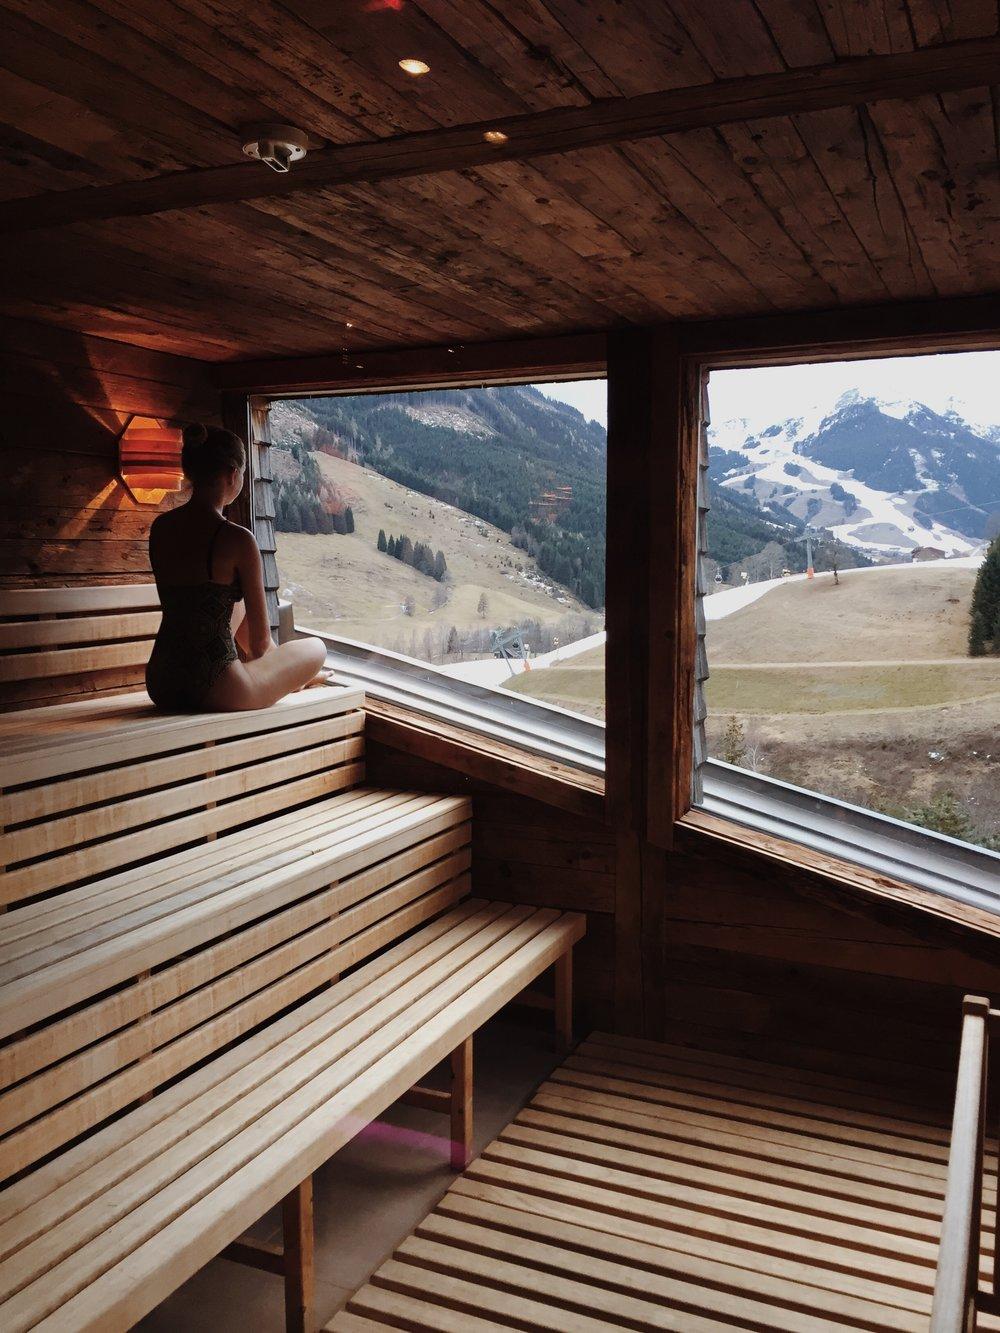 Sauna in Hotel Art & Ski in Hinterhag, Saalbach Hinterglemm, Austria